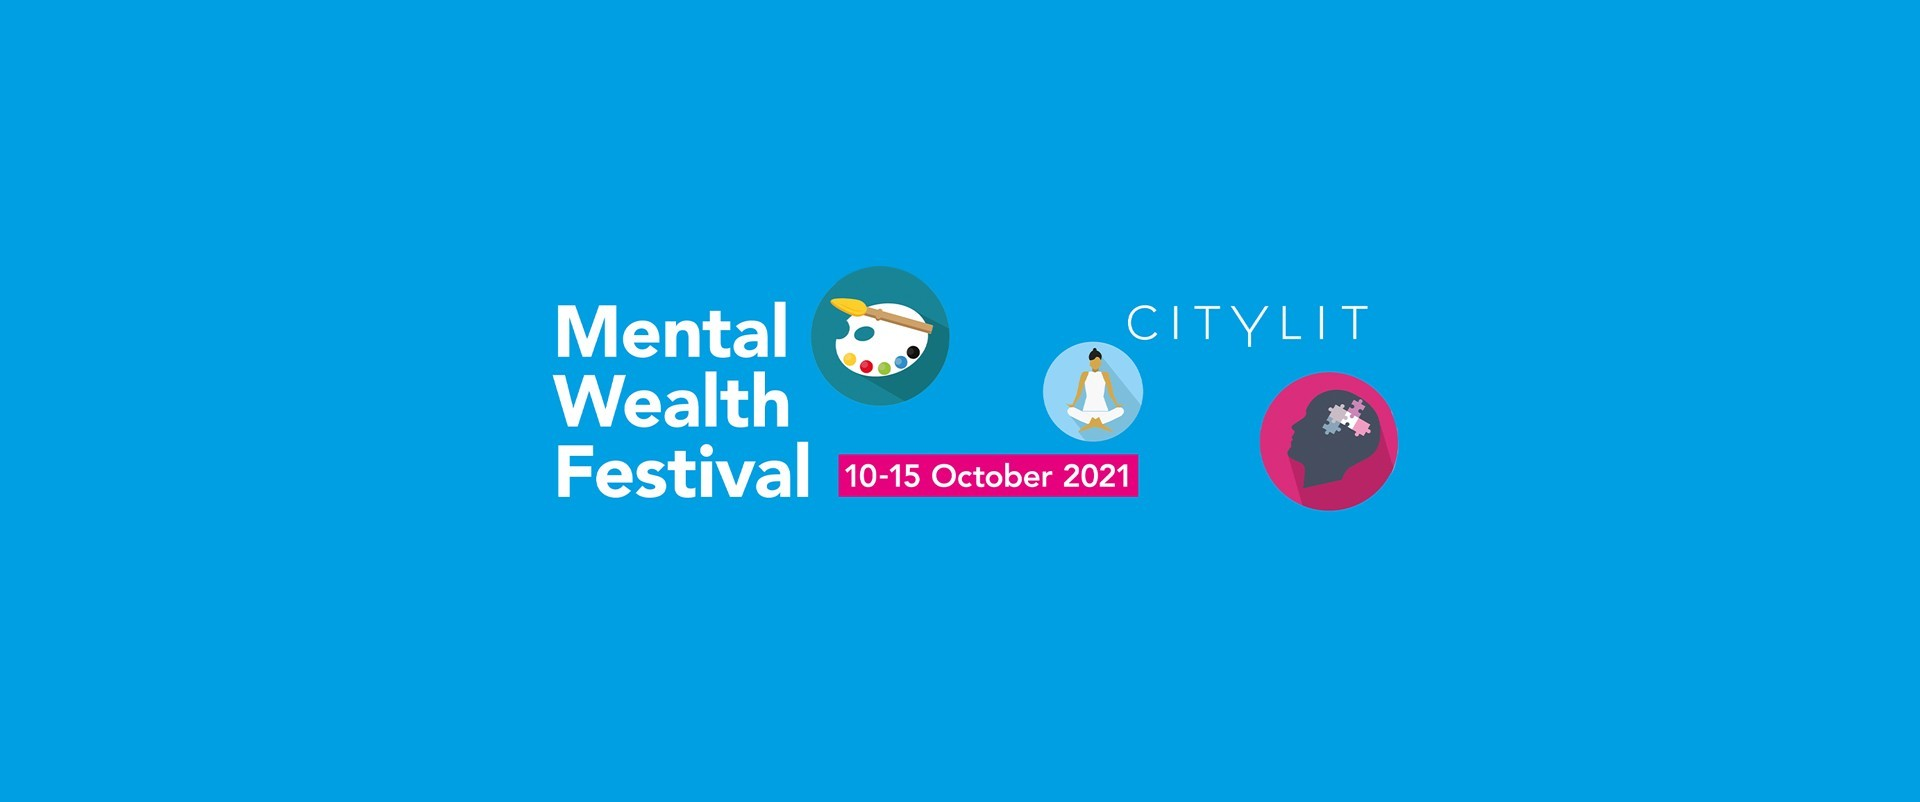 Mental Wealth Festival by City Lit branding